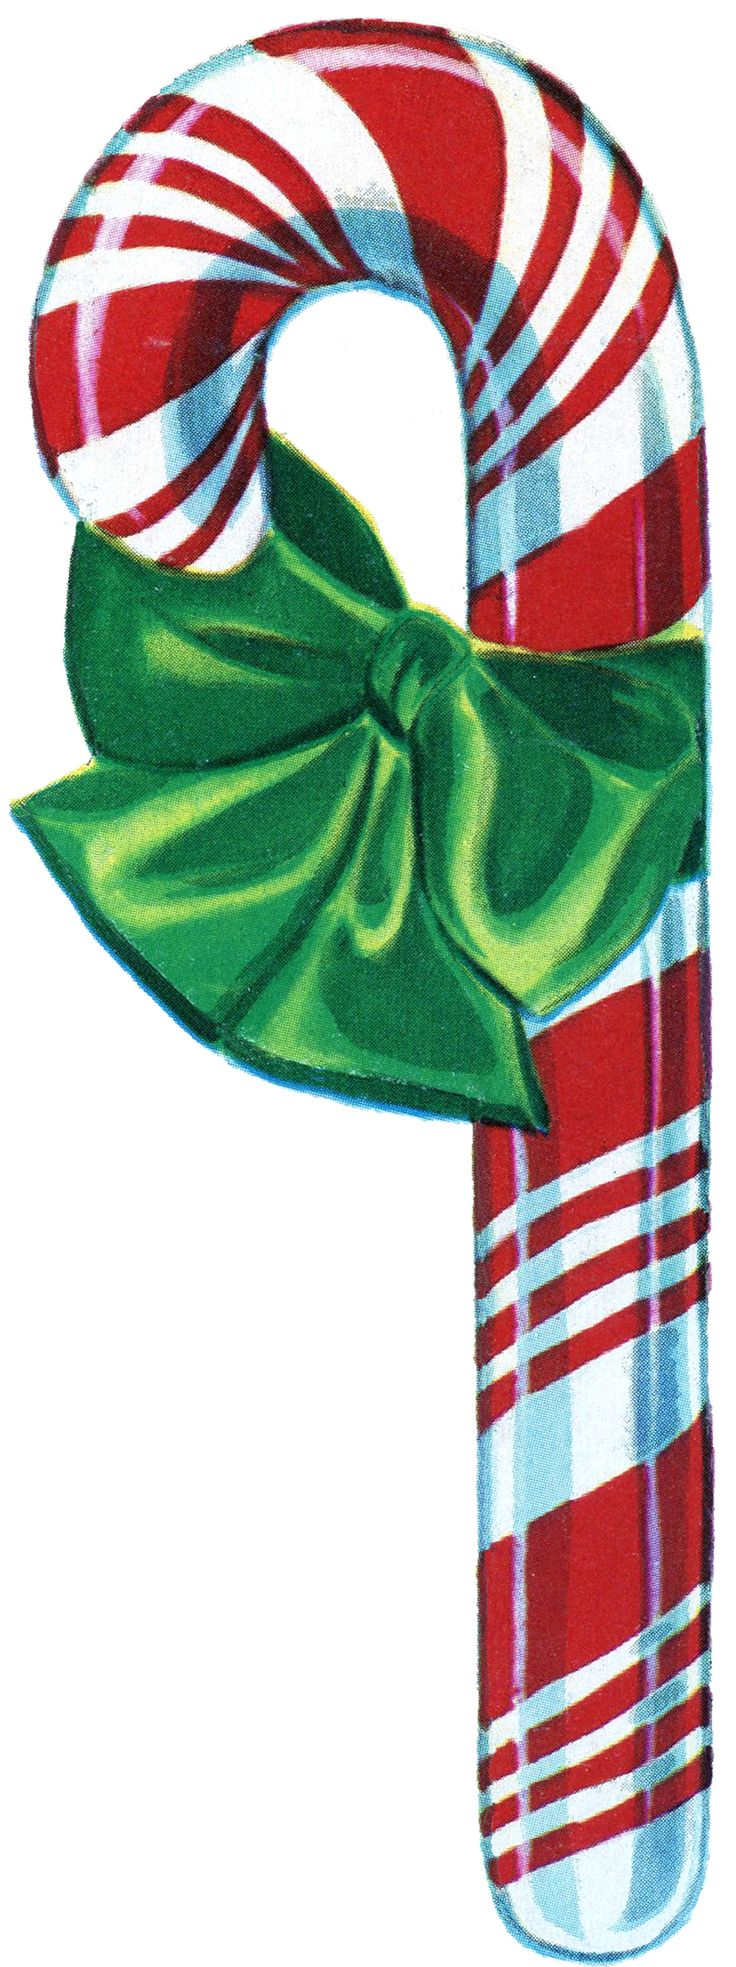 736x1967 Best Free Christmas Clip Art Ideas Floral